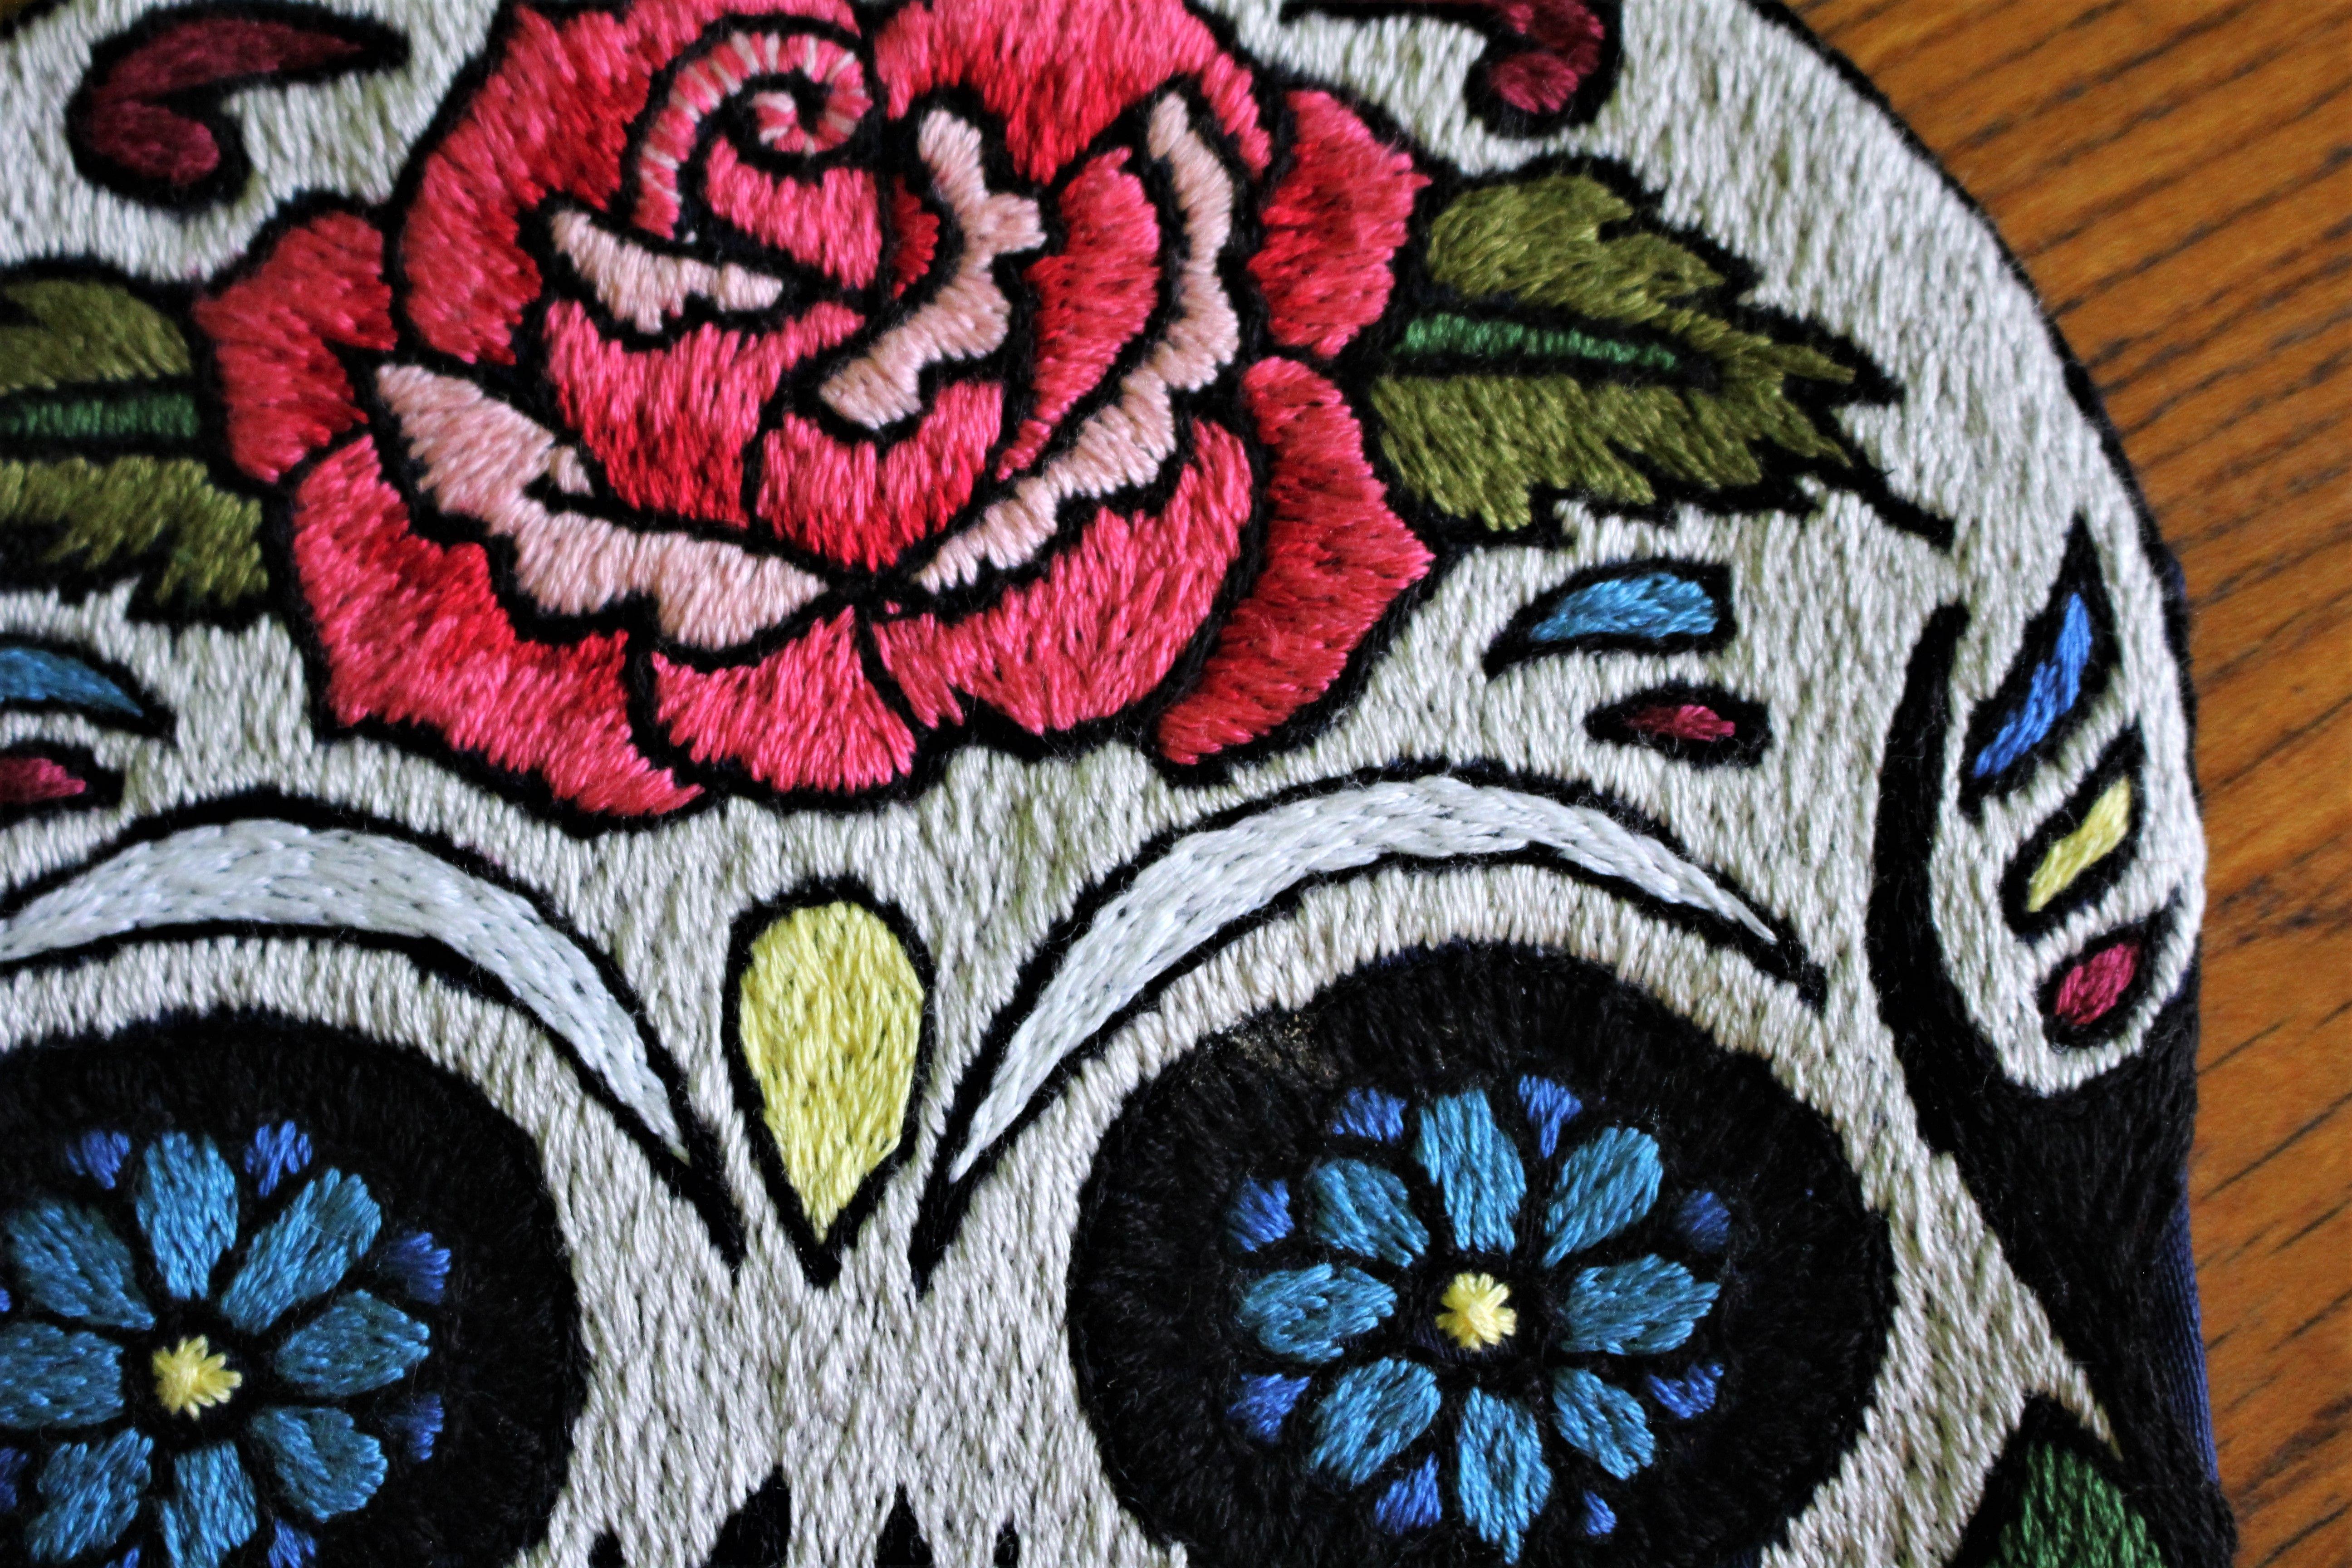 Oldschool Tattoo Design Embroidery Handmade Sugar Skull Old School Tattoo Designs Handmade Crafts Old School Tattoo